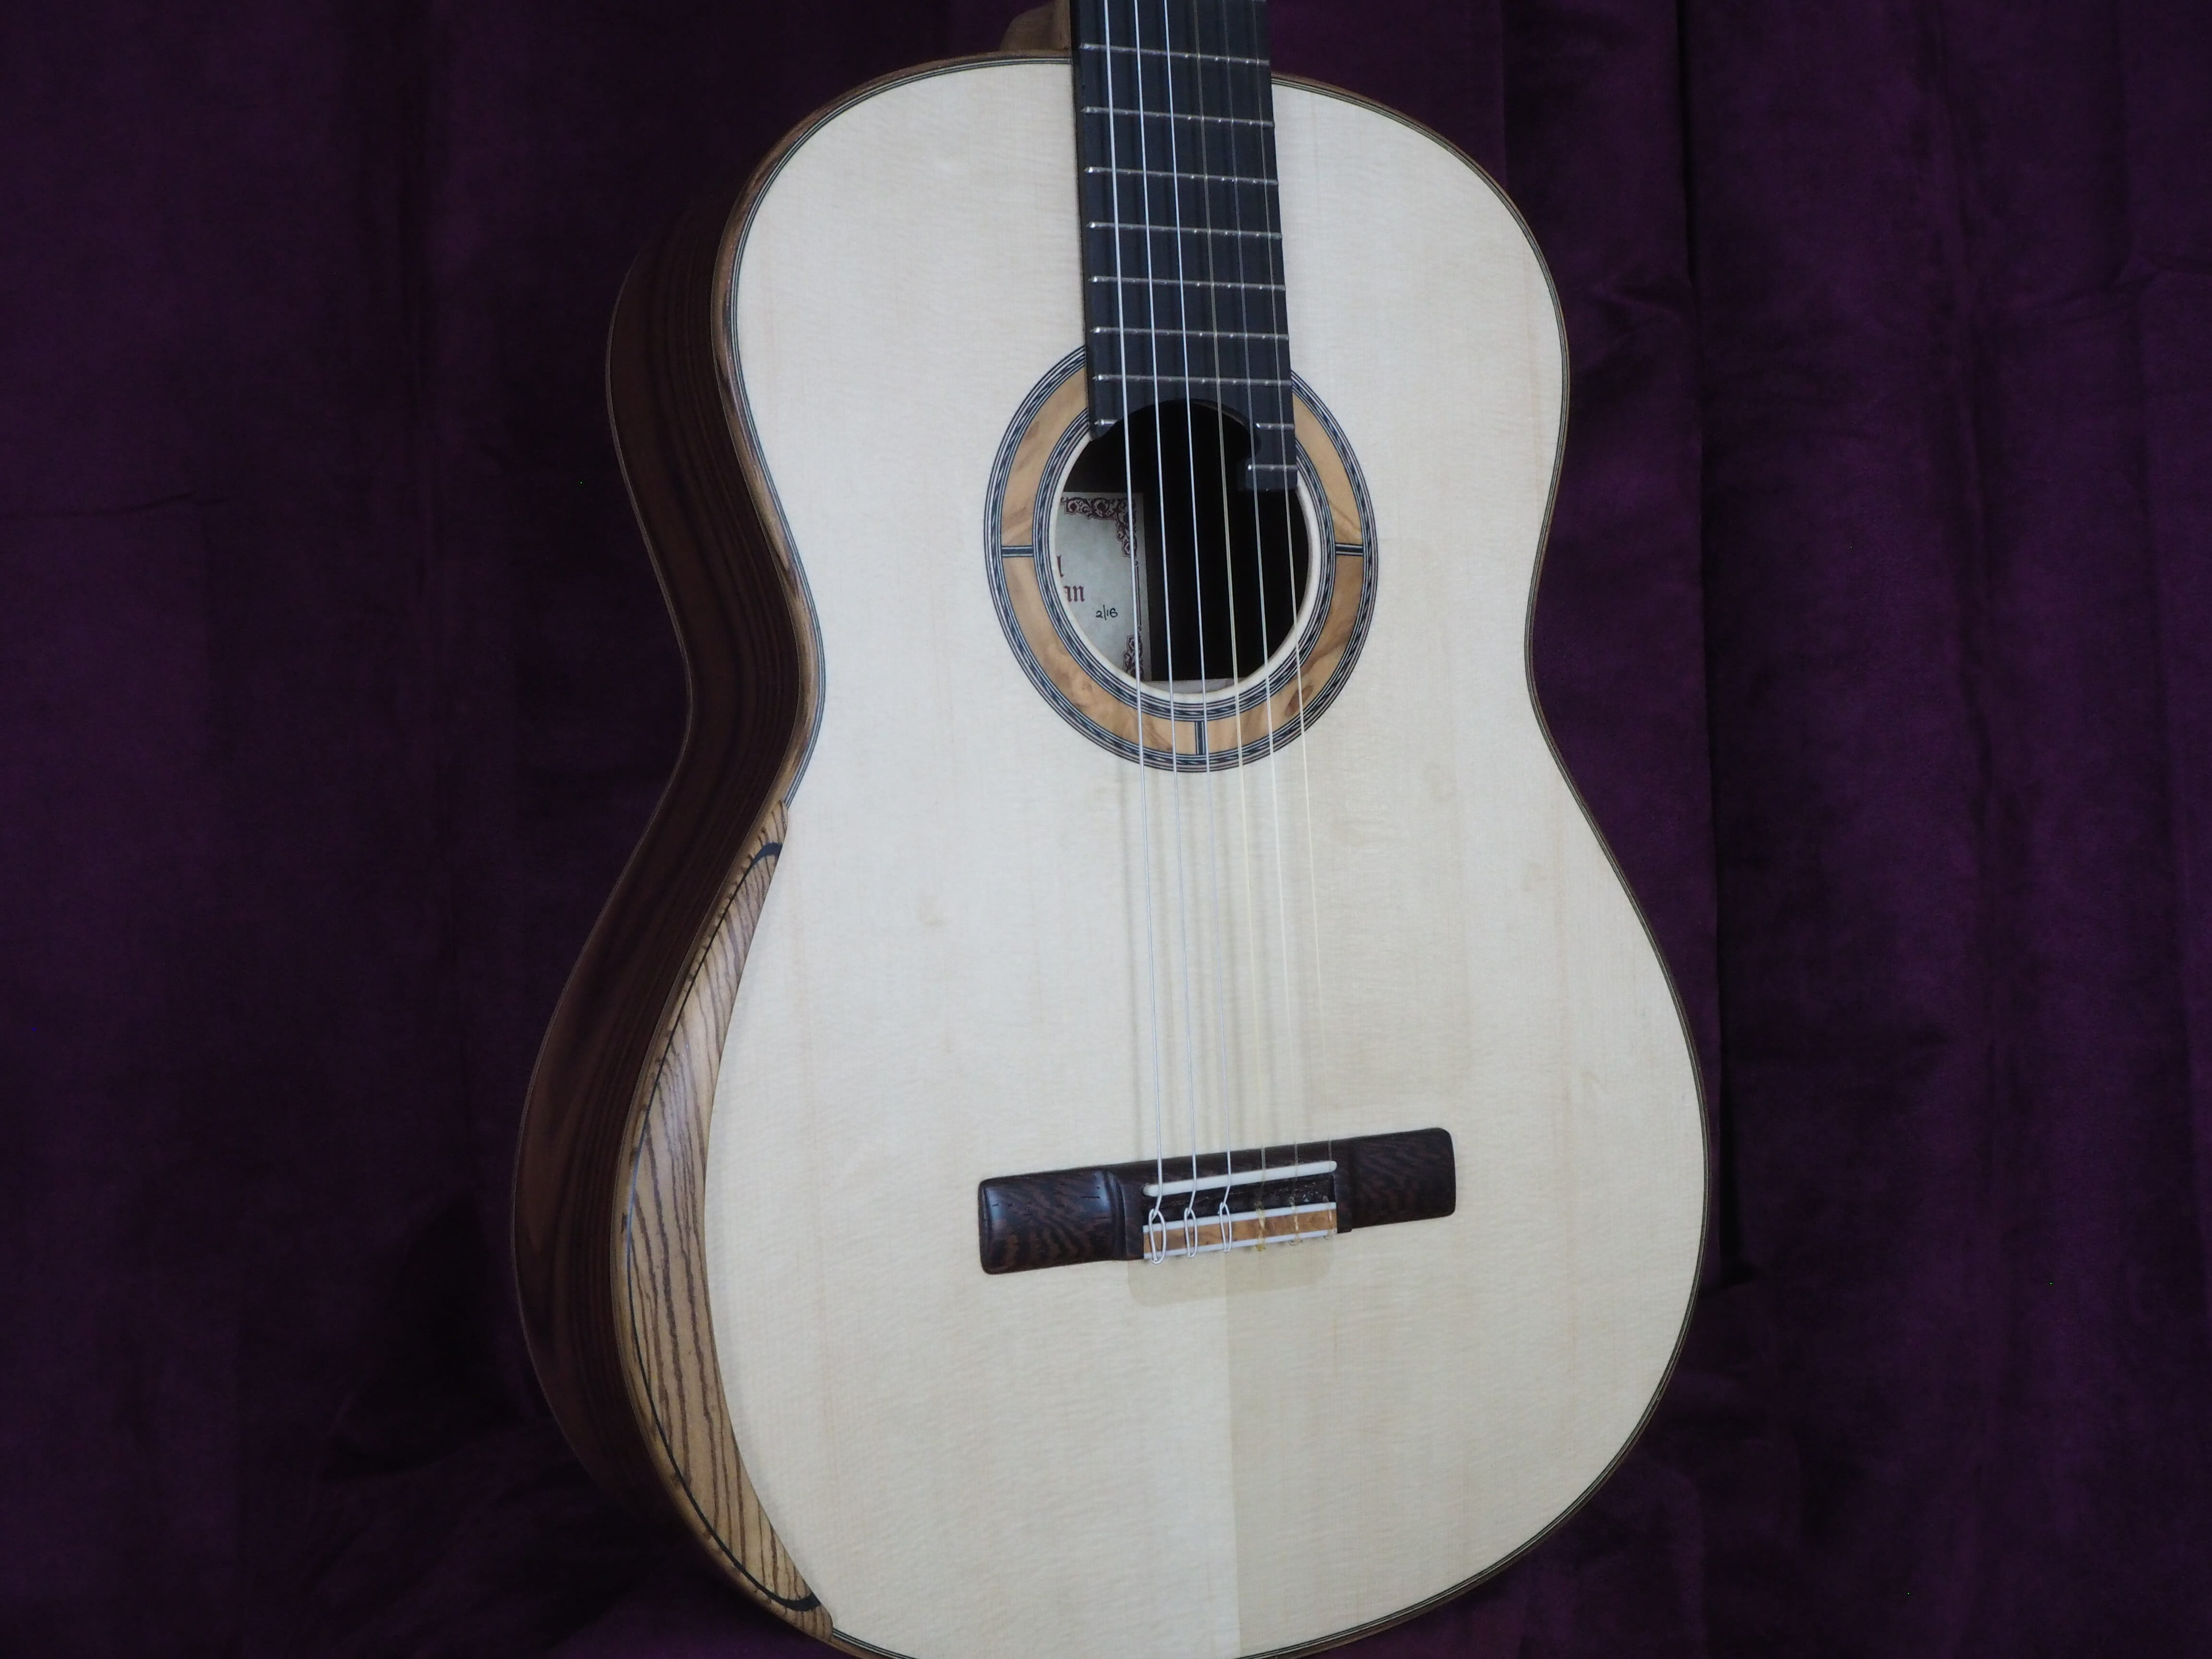 Paul sheridan classical guitar de concert lattice